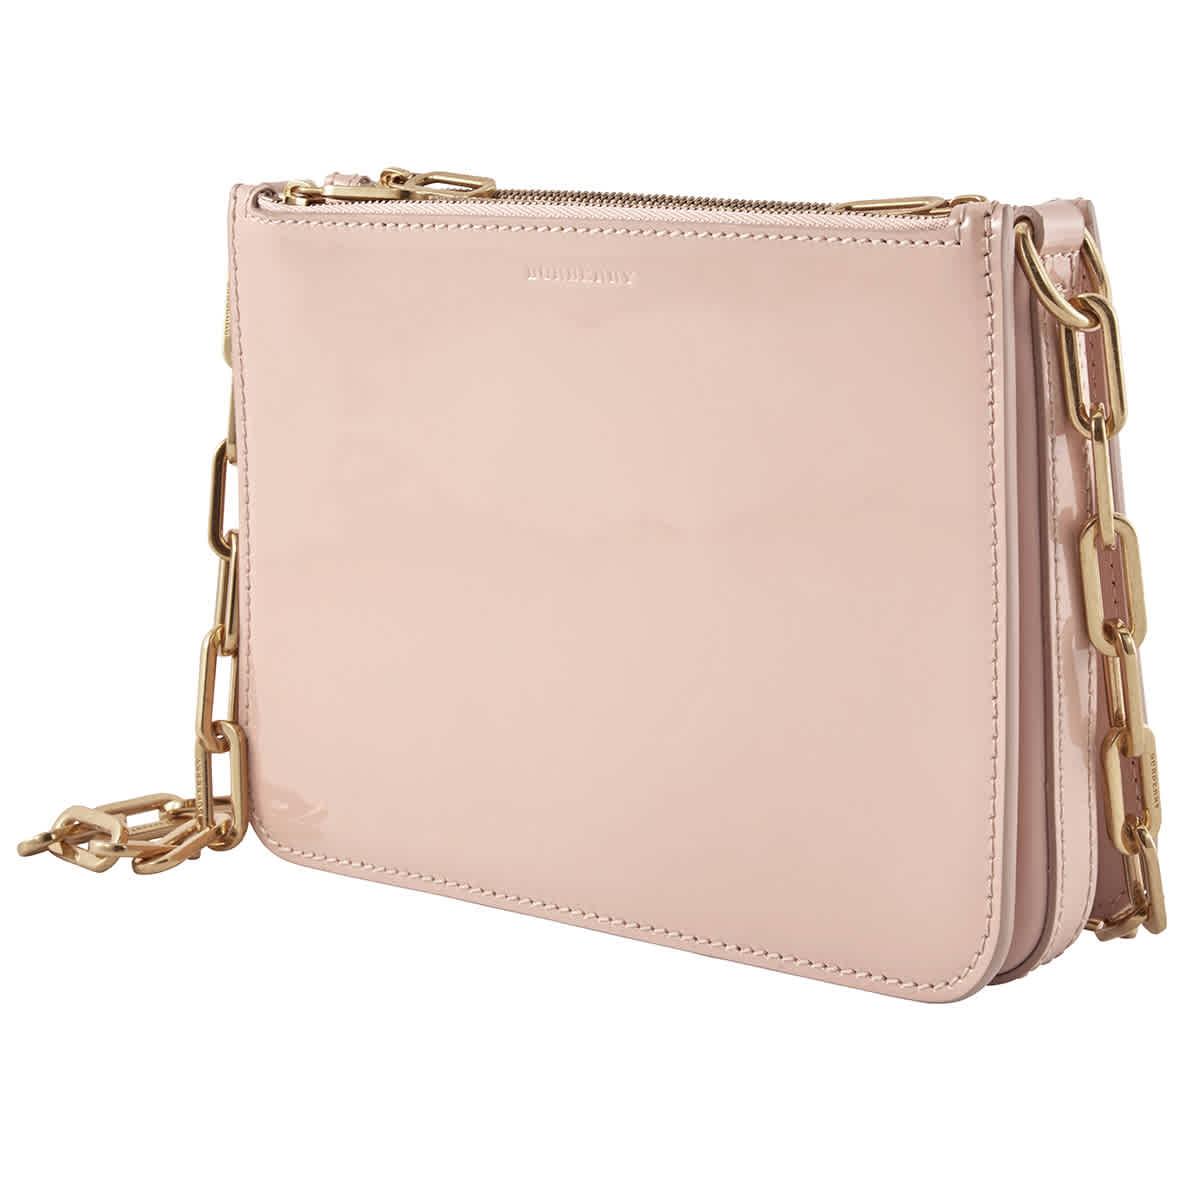 Burberry Pale Fawn Pink Penhurst Chain-link Shoulder Bag